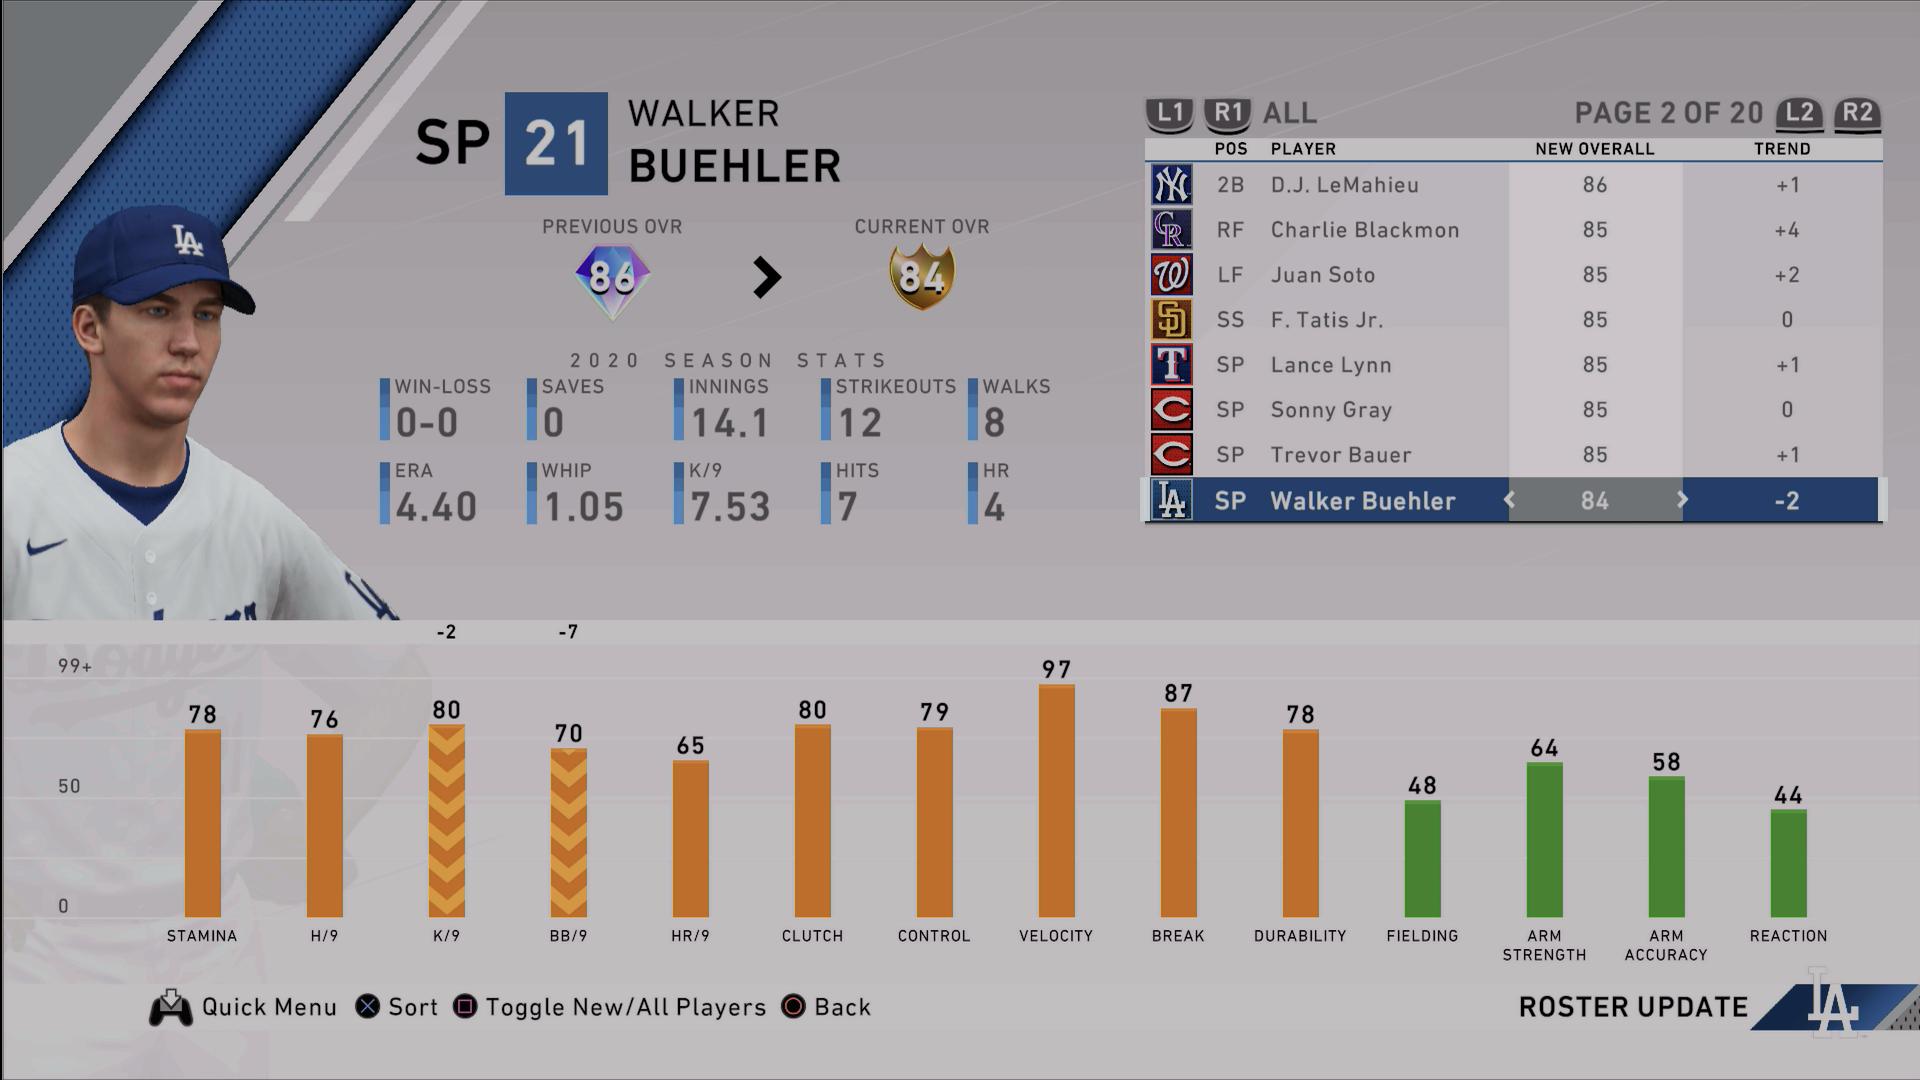 walker-buehler-down-to-gold